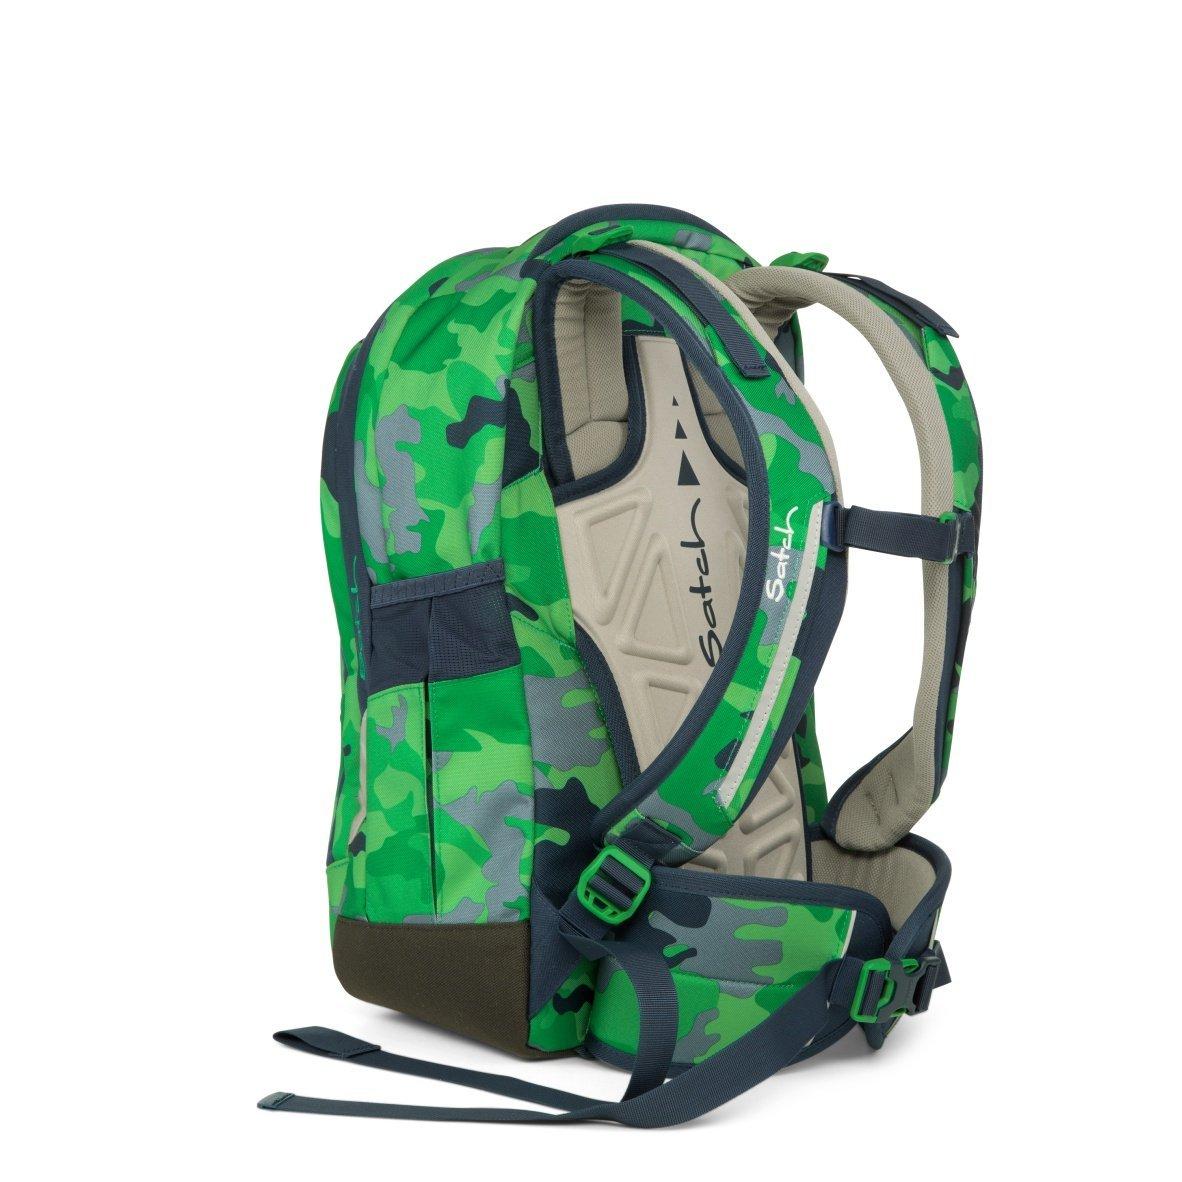 Рюкзак Ergobag Satch Sleek цвет Green Camou, - фото 4